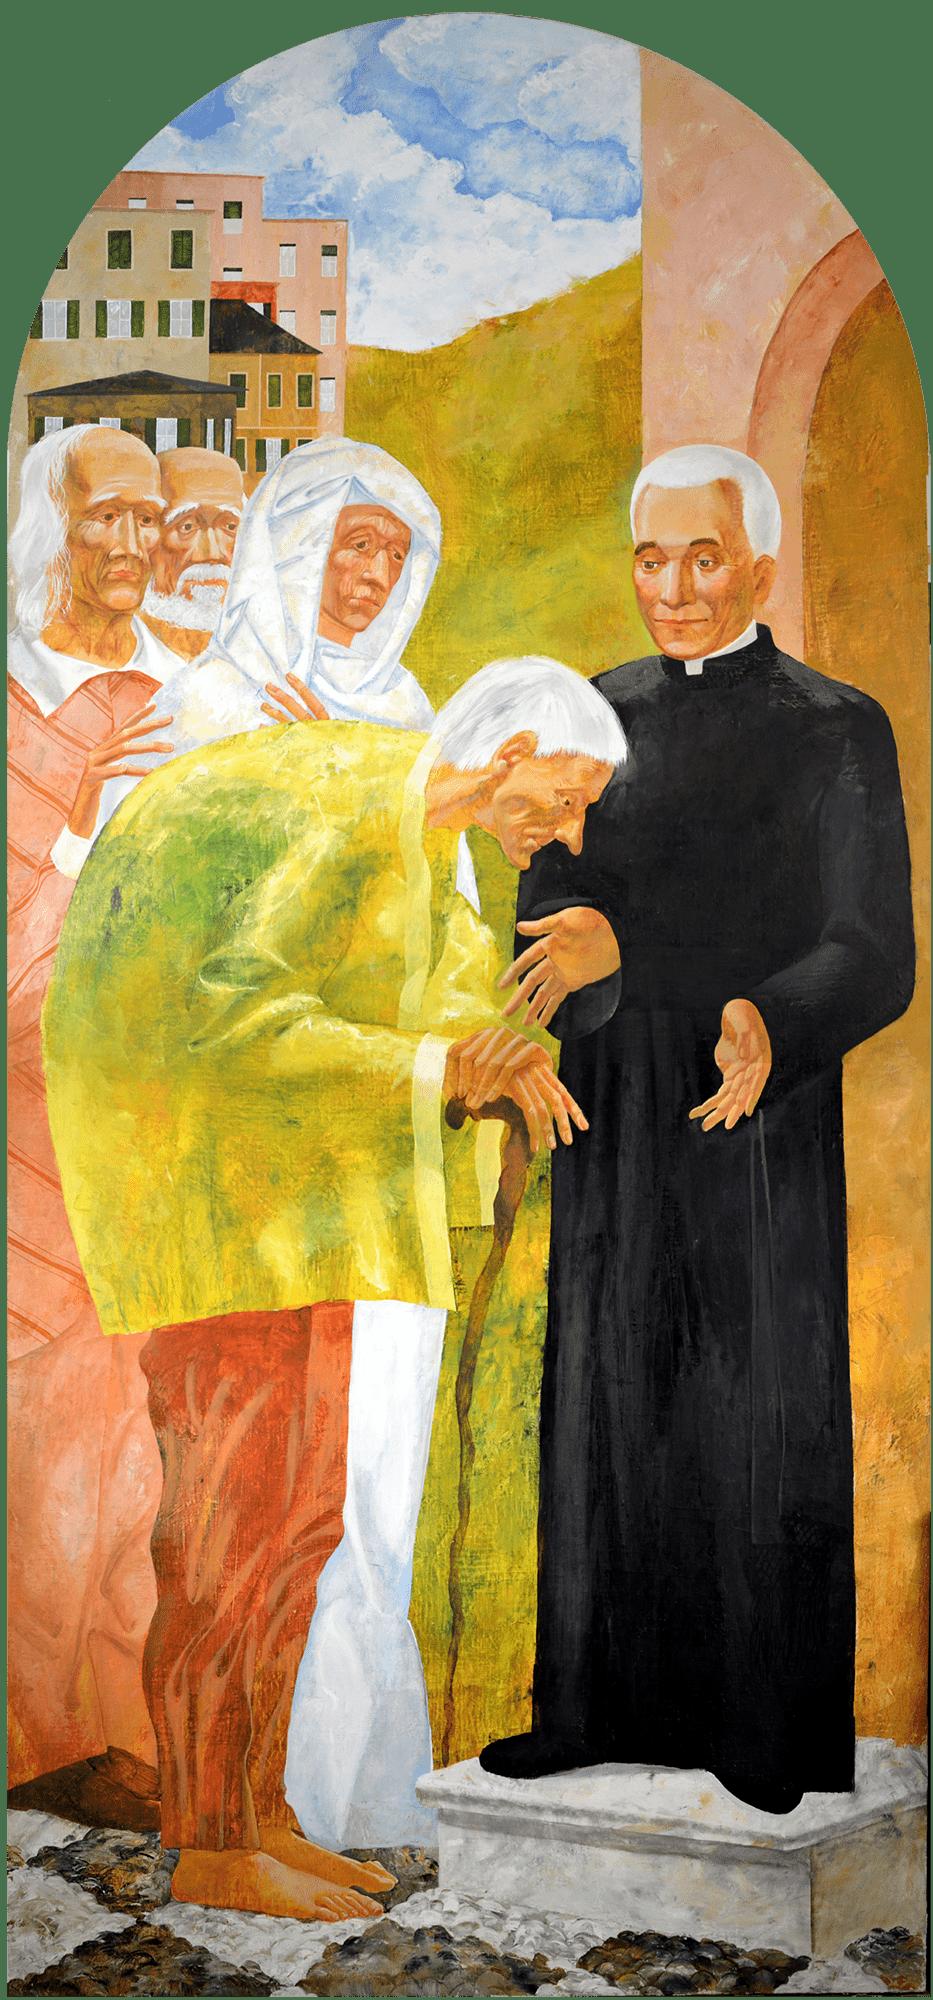 Denys Savchenko. Religious painting. Oil painting. Don Orione